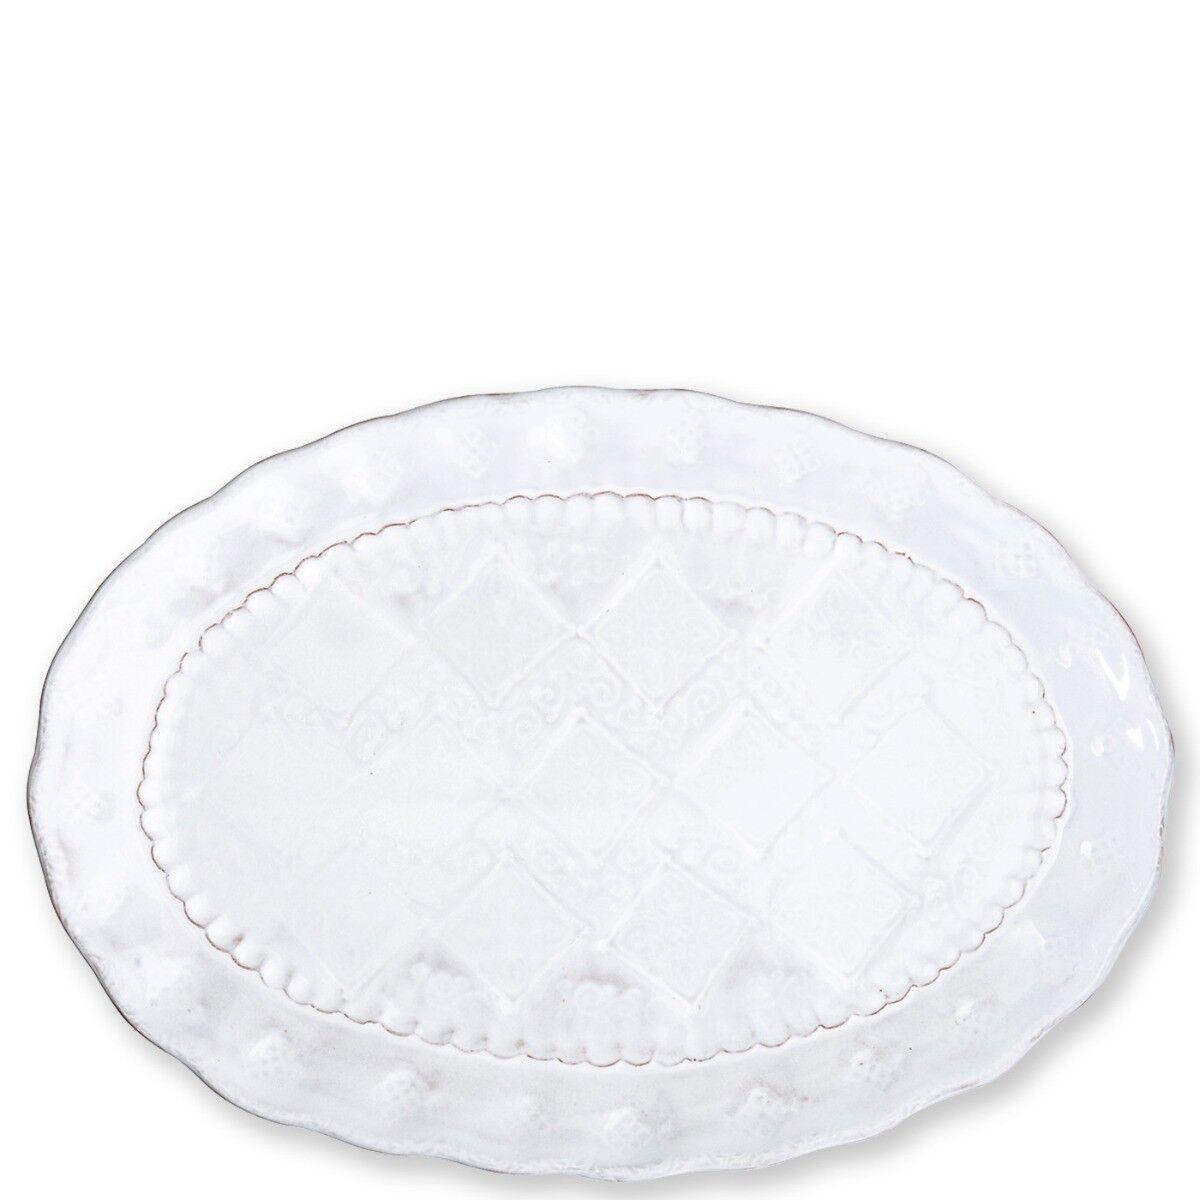 Vietri Bellezza Stone blanc Medium Oval Platter